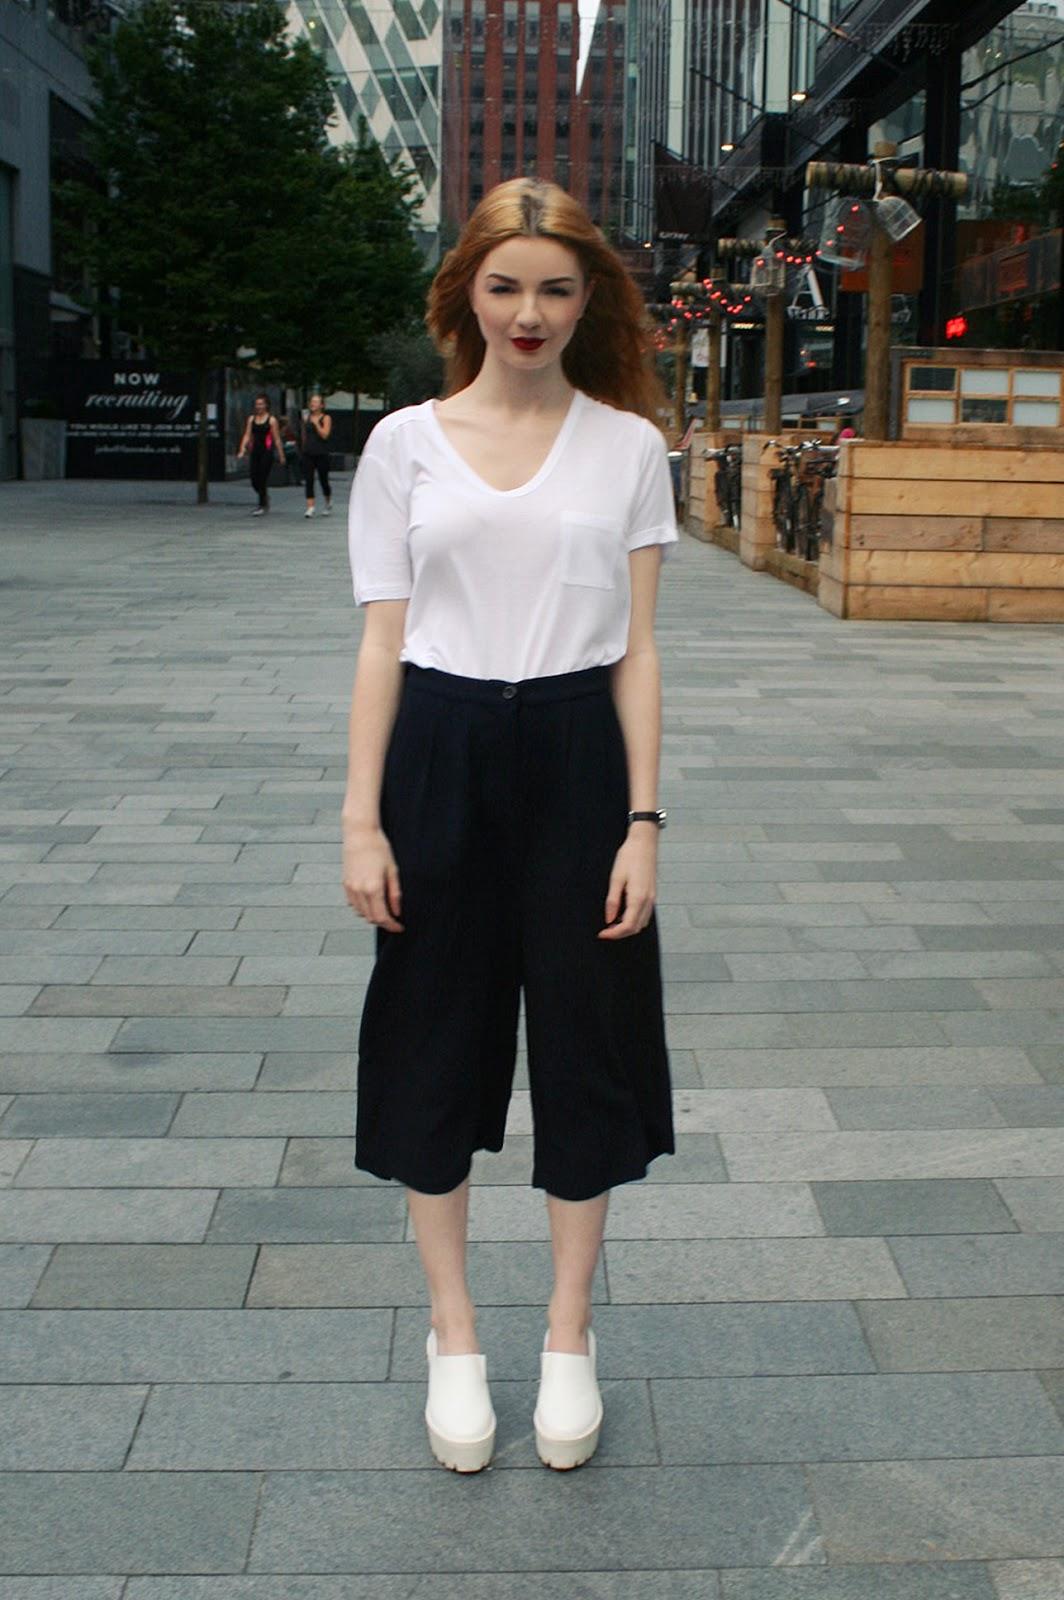 Plaid Shirts Outfits Tumblr Bcd Tofu House